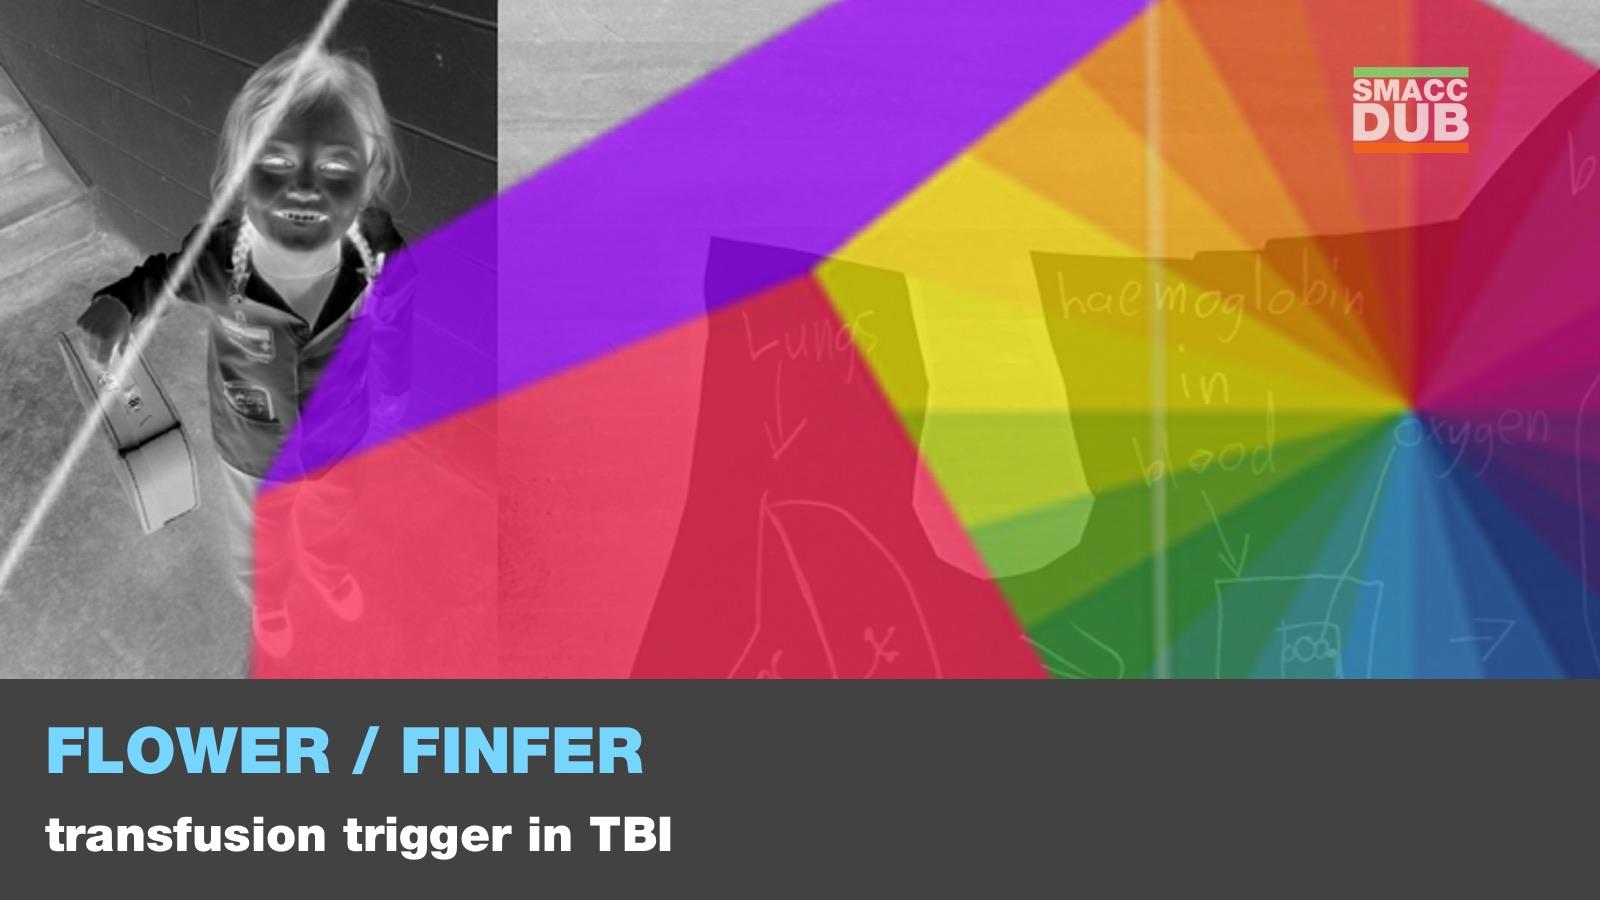 Flower Finfer - Transfusion trigger TBI